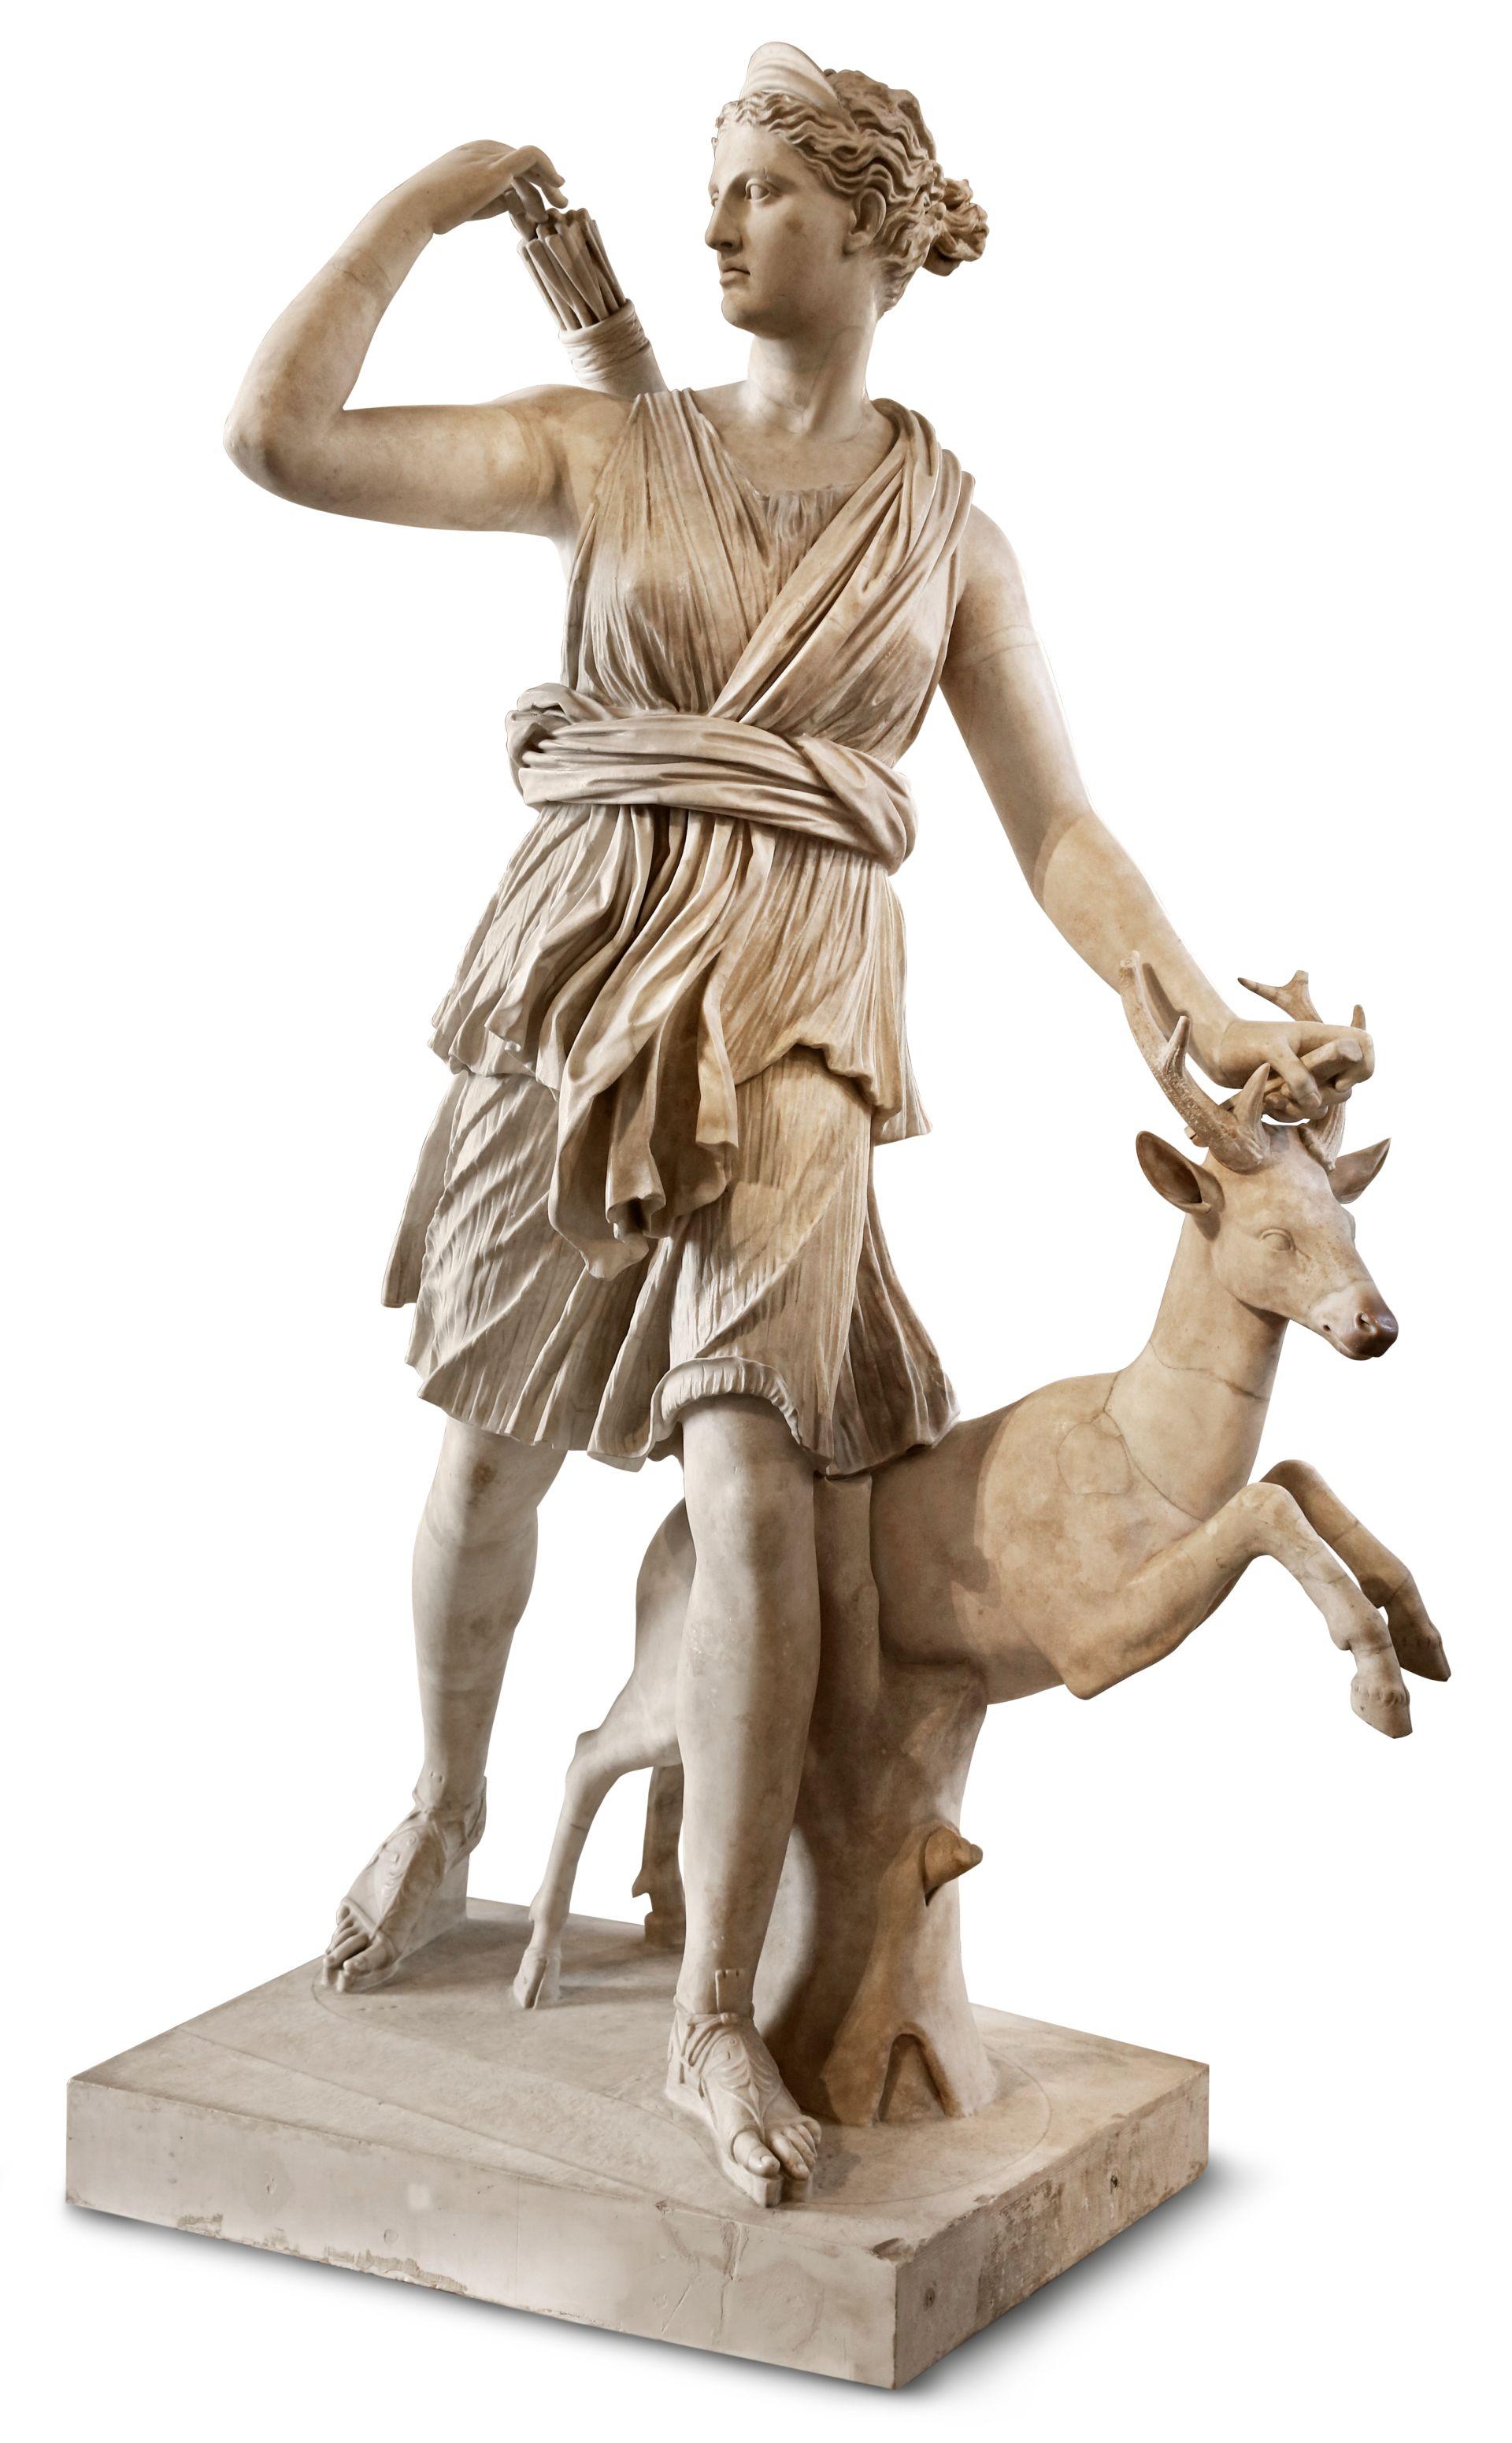 Artemis Greek Goddess | Facts About Artemis | DK Find Out